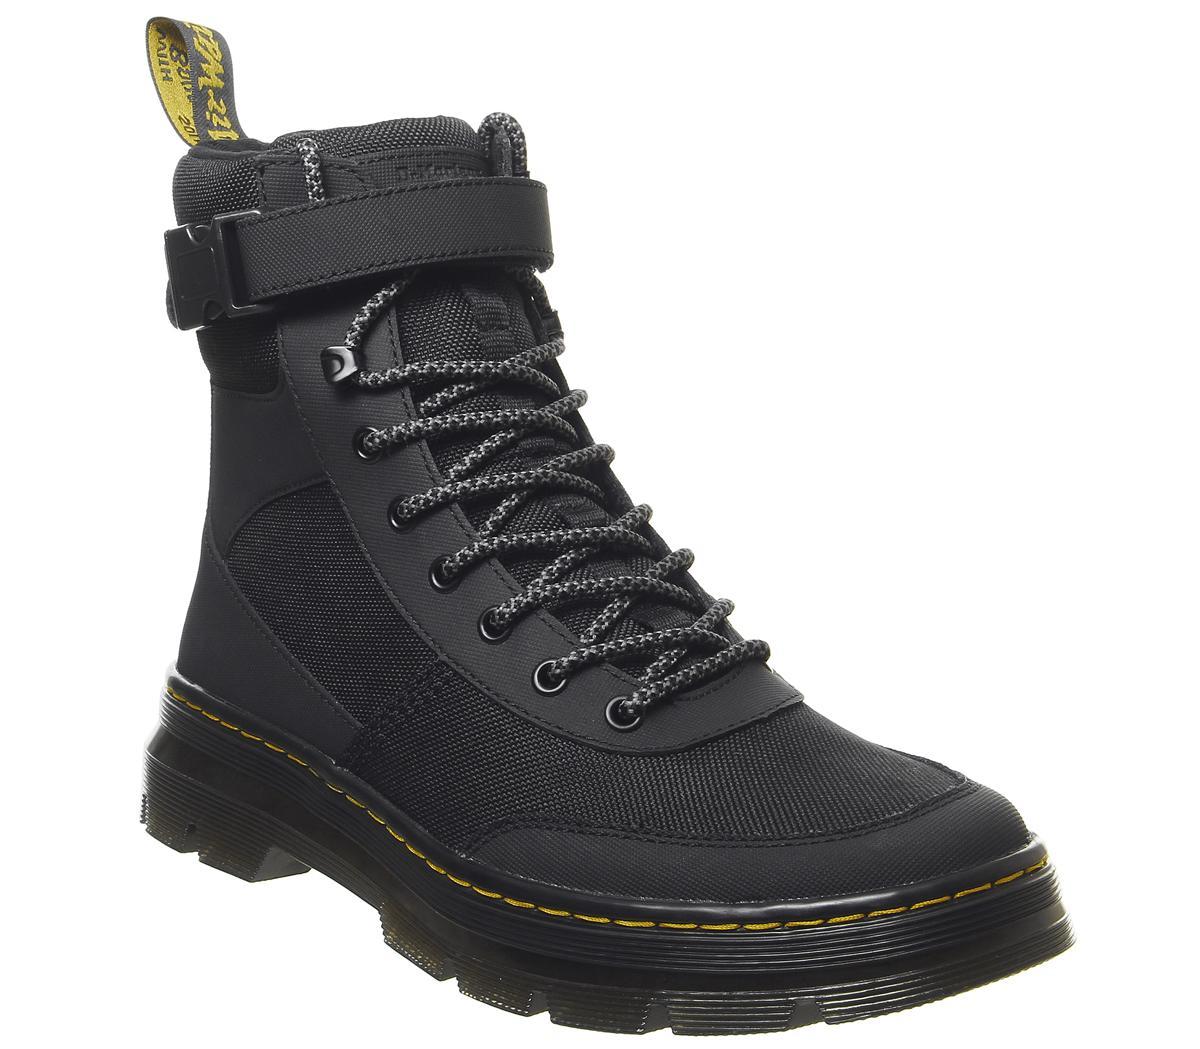 Dr. Martens Combs Tech Boots Black - Boots